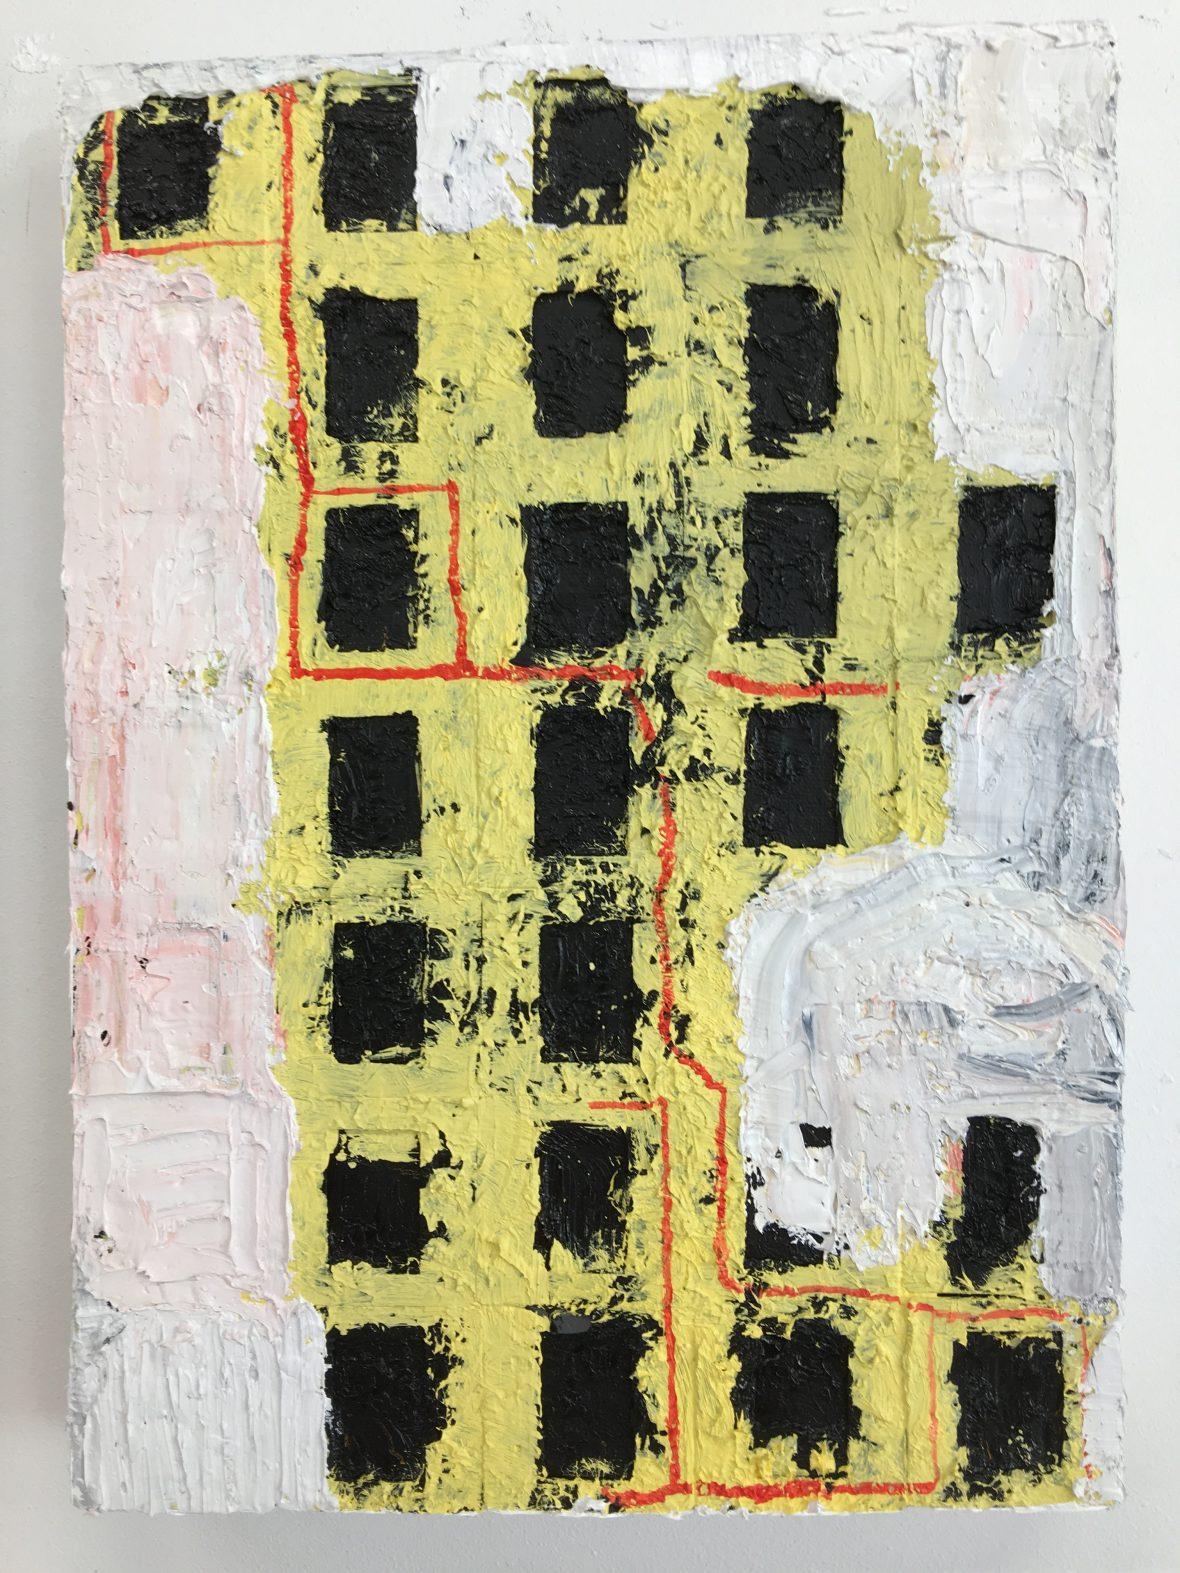 Målning / Maalaus / Painting 35 x 25 cm, 2018